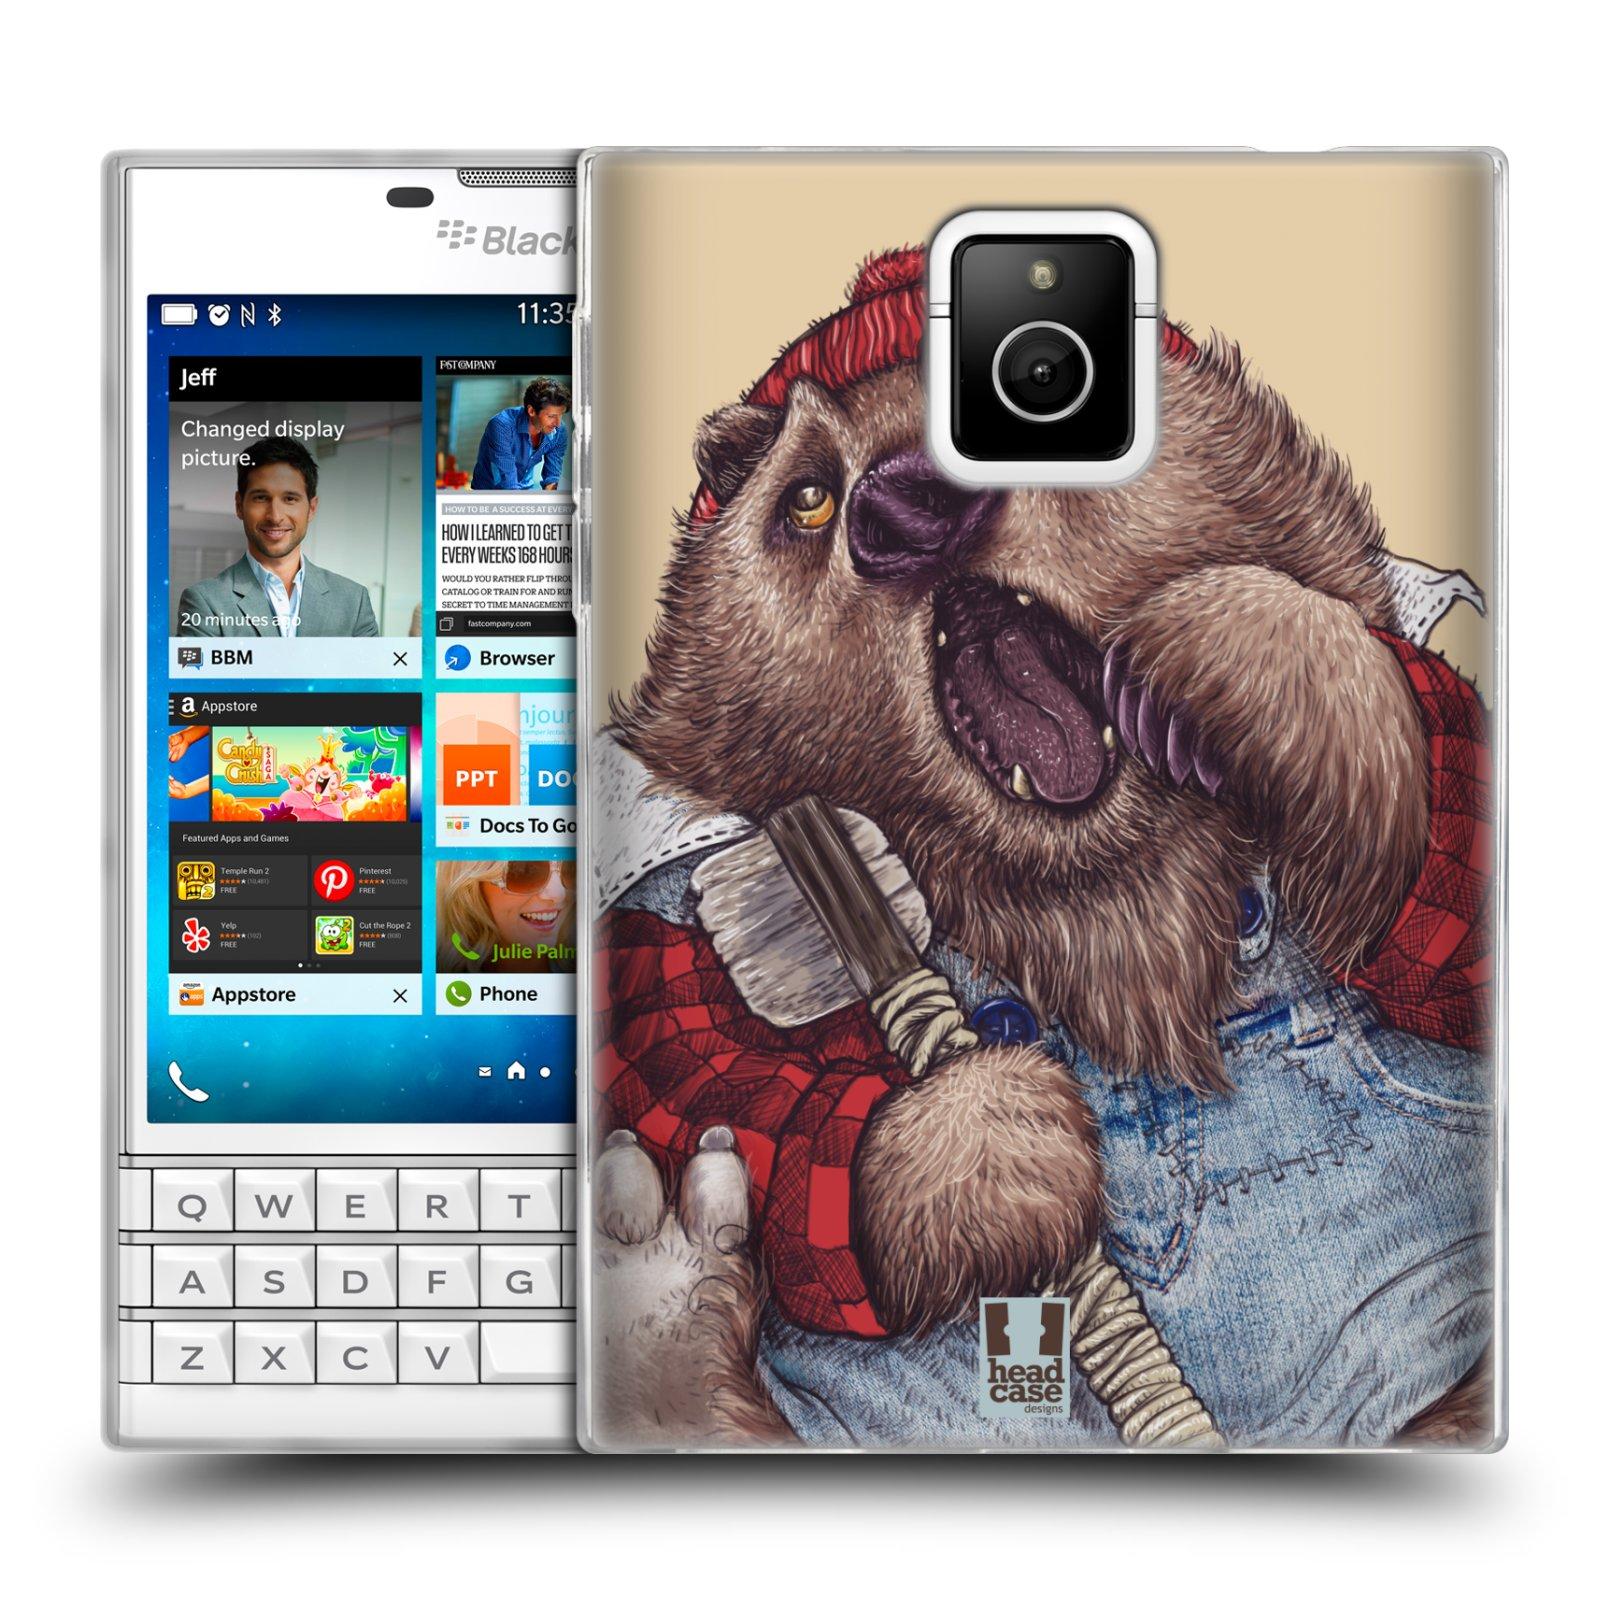 HEAD CASE silikonový obal na mobil Blackberry PASSPORT vzor Kreslená zvířátka medvěd